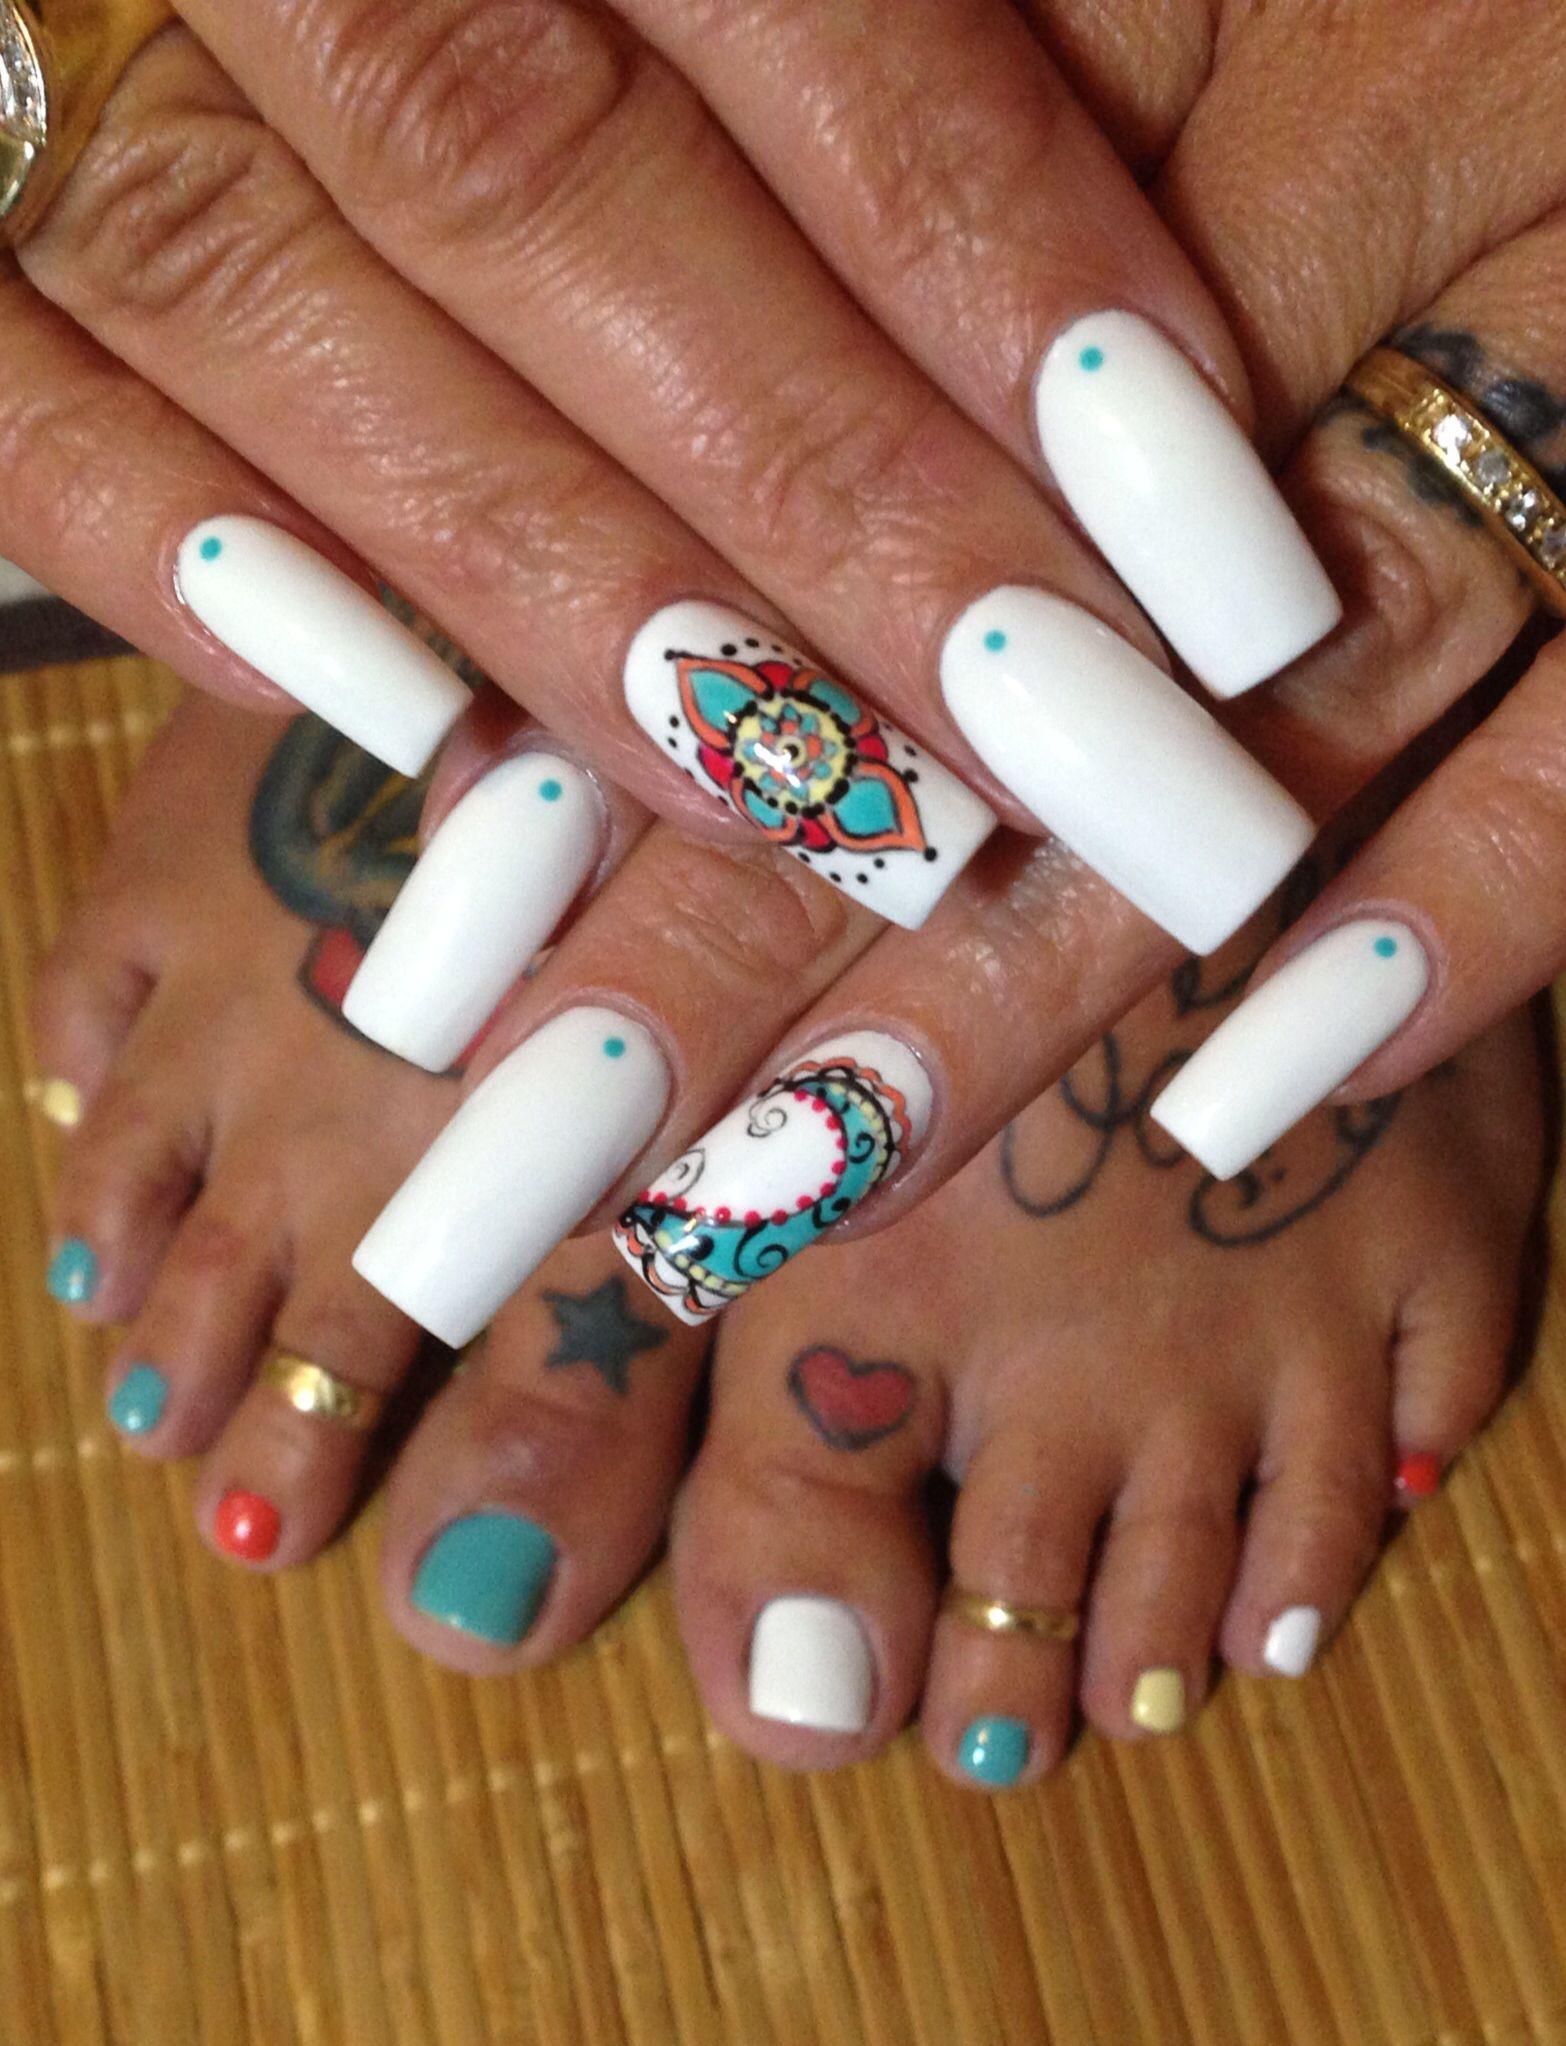 Mandala gel nail art | The Nail Bar | Pinterest